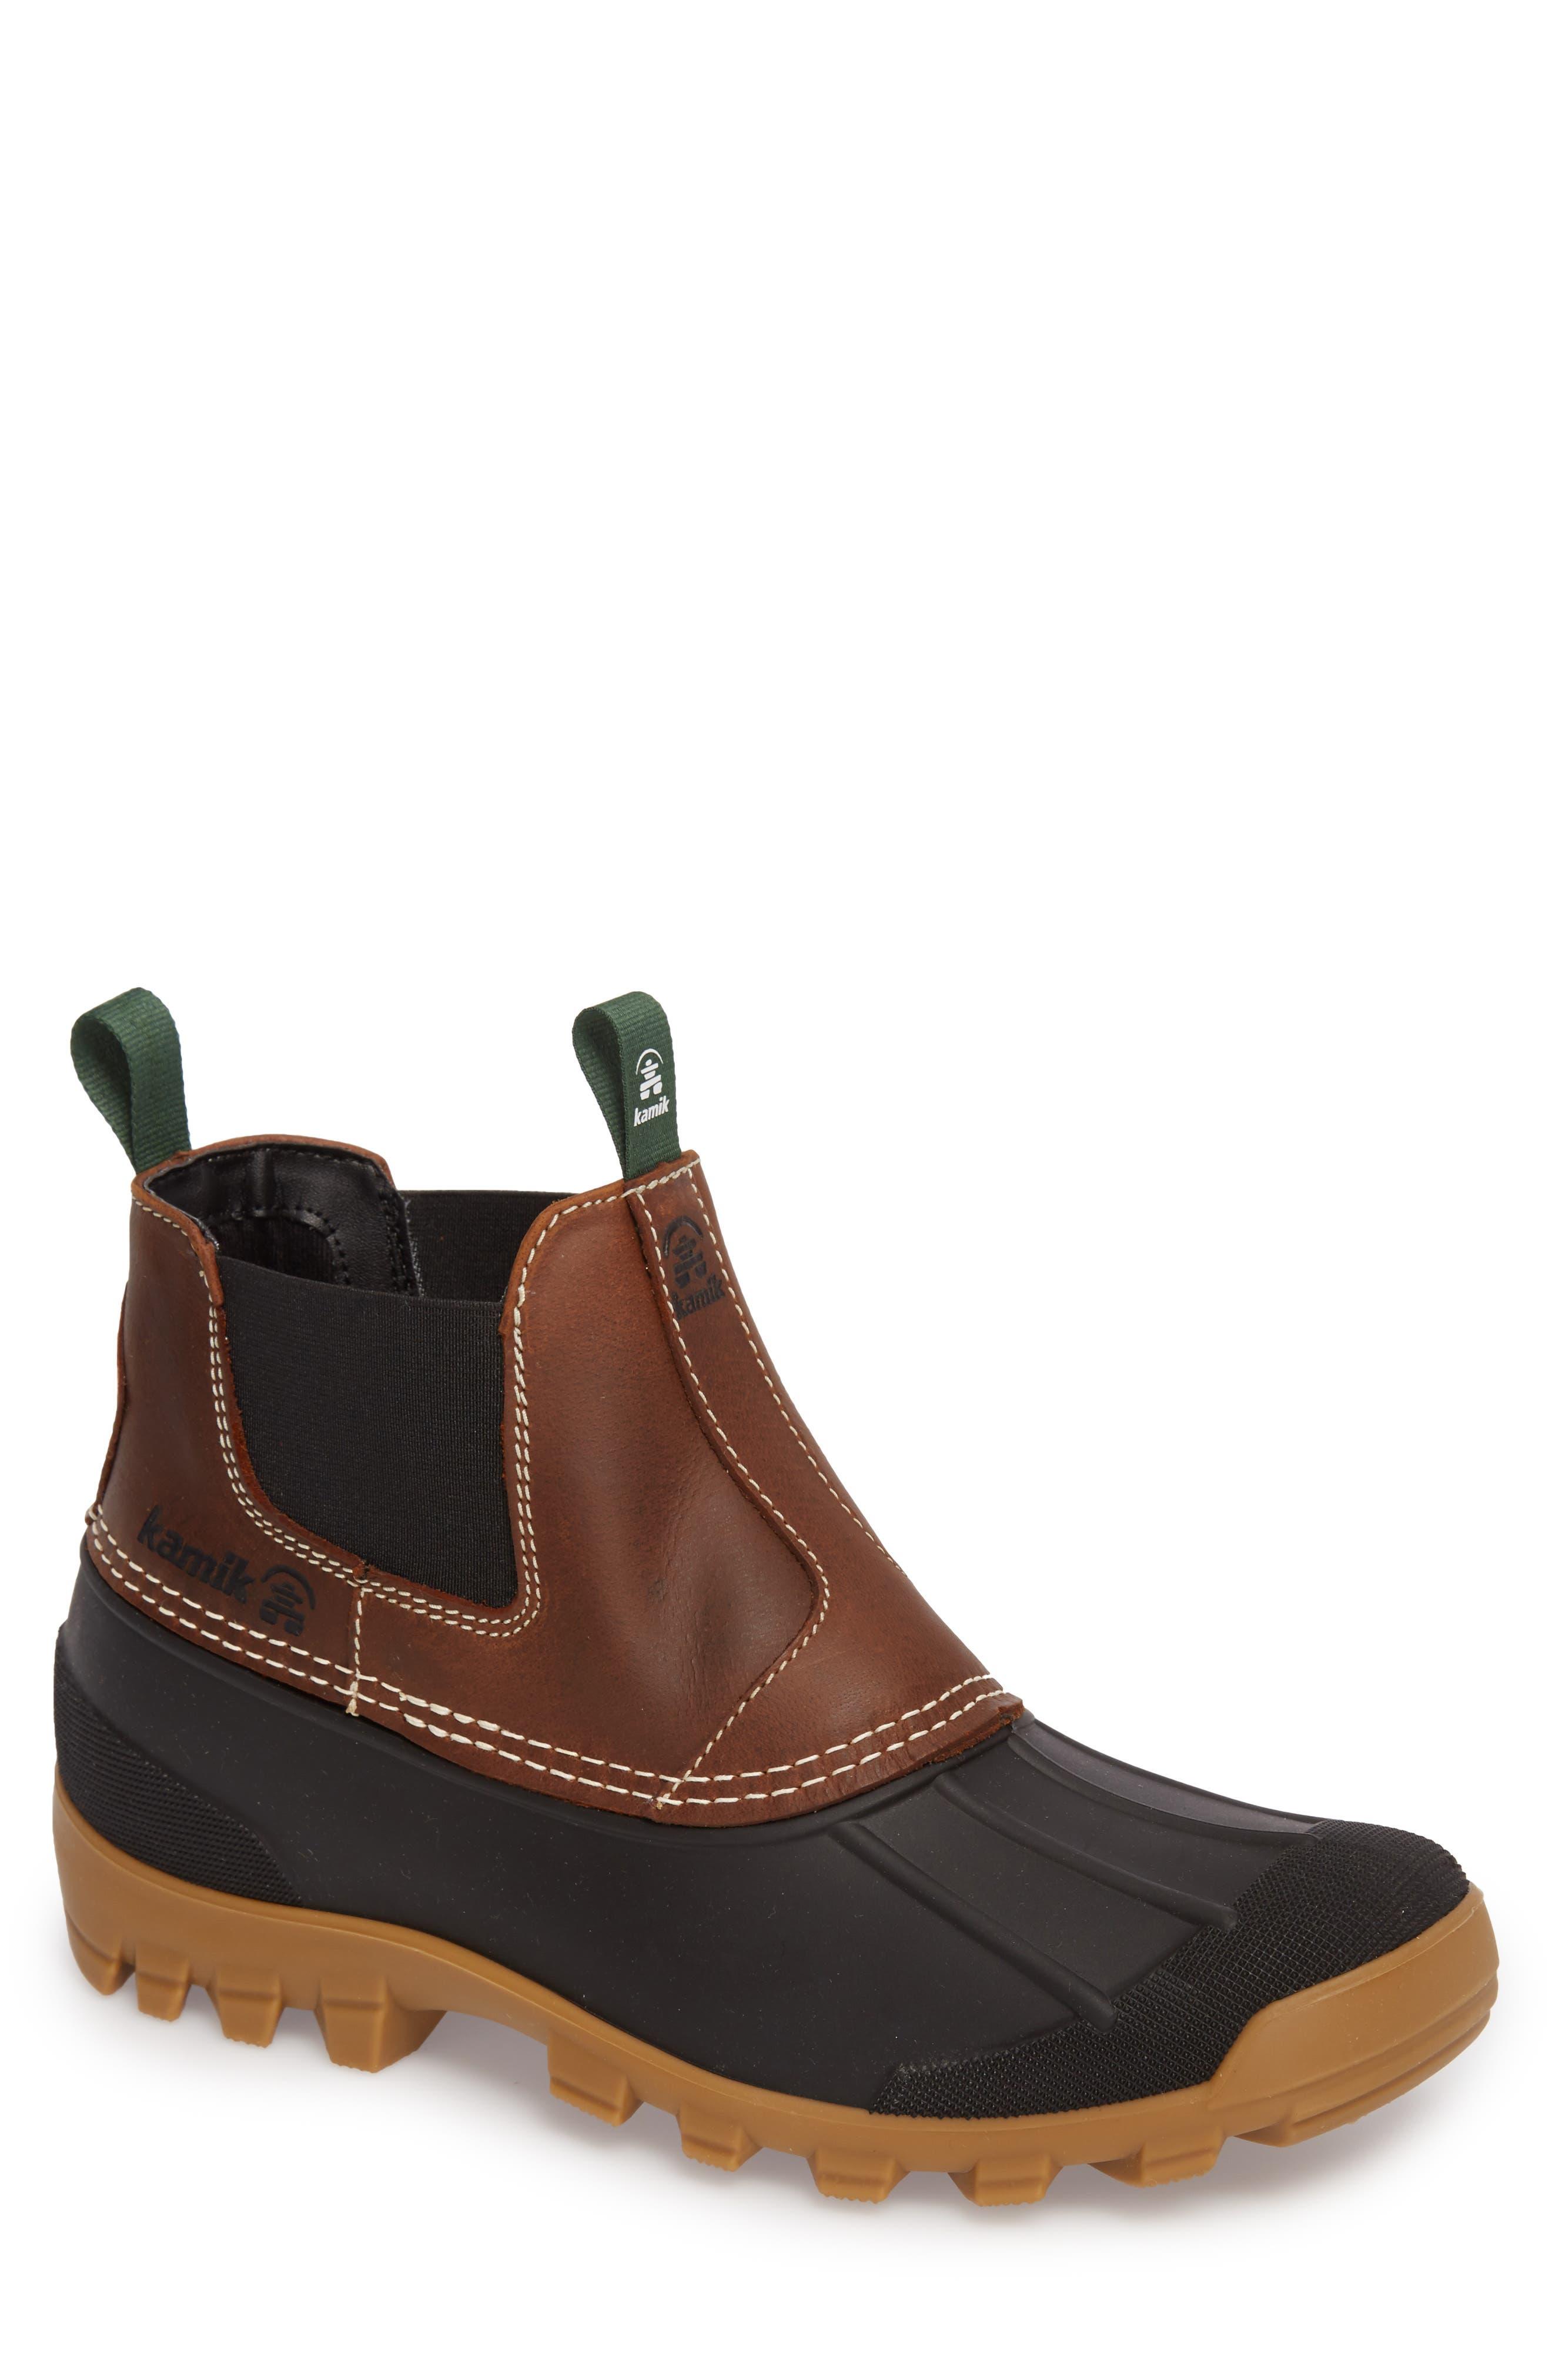 Yukon Chelsea Boot,                         Main,                         color, Dark Brown Leather